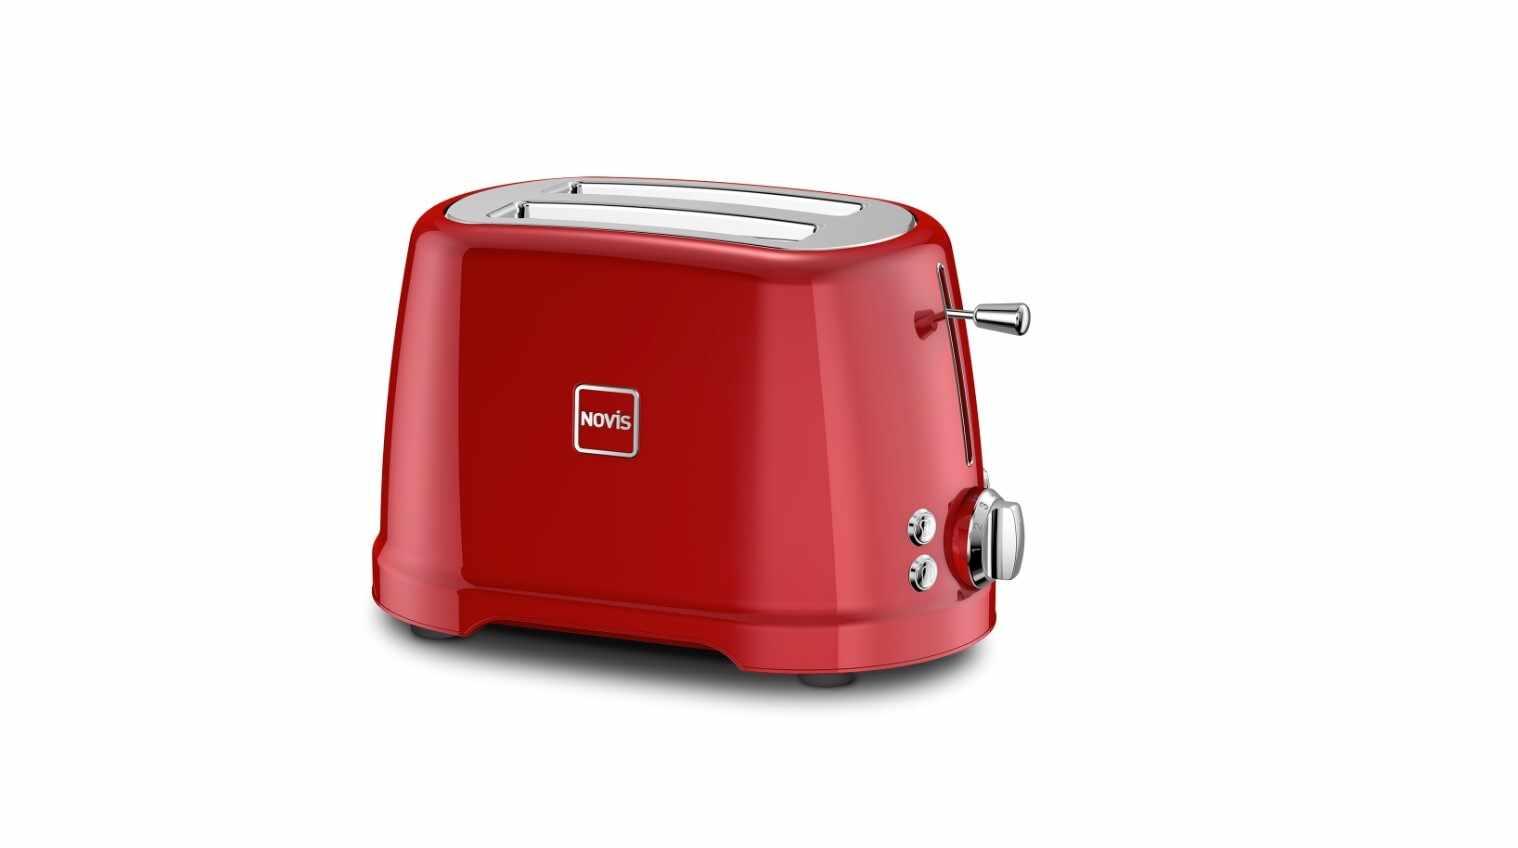 Toaster 2 sloturi, 4 functii, 900W, Novis T2 Rosu la pret 708 lei